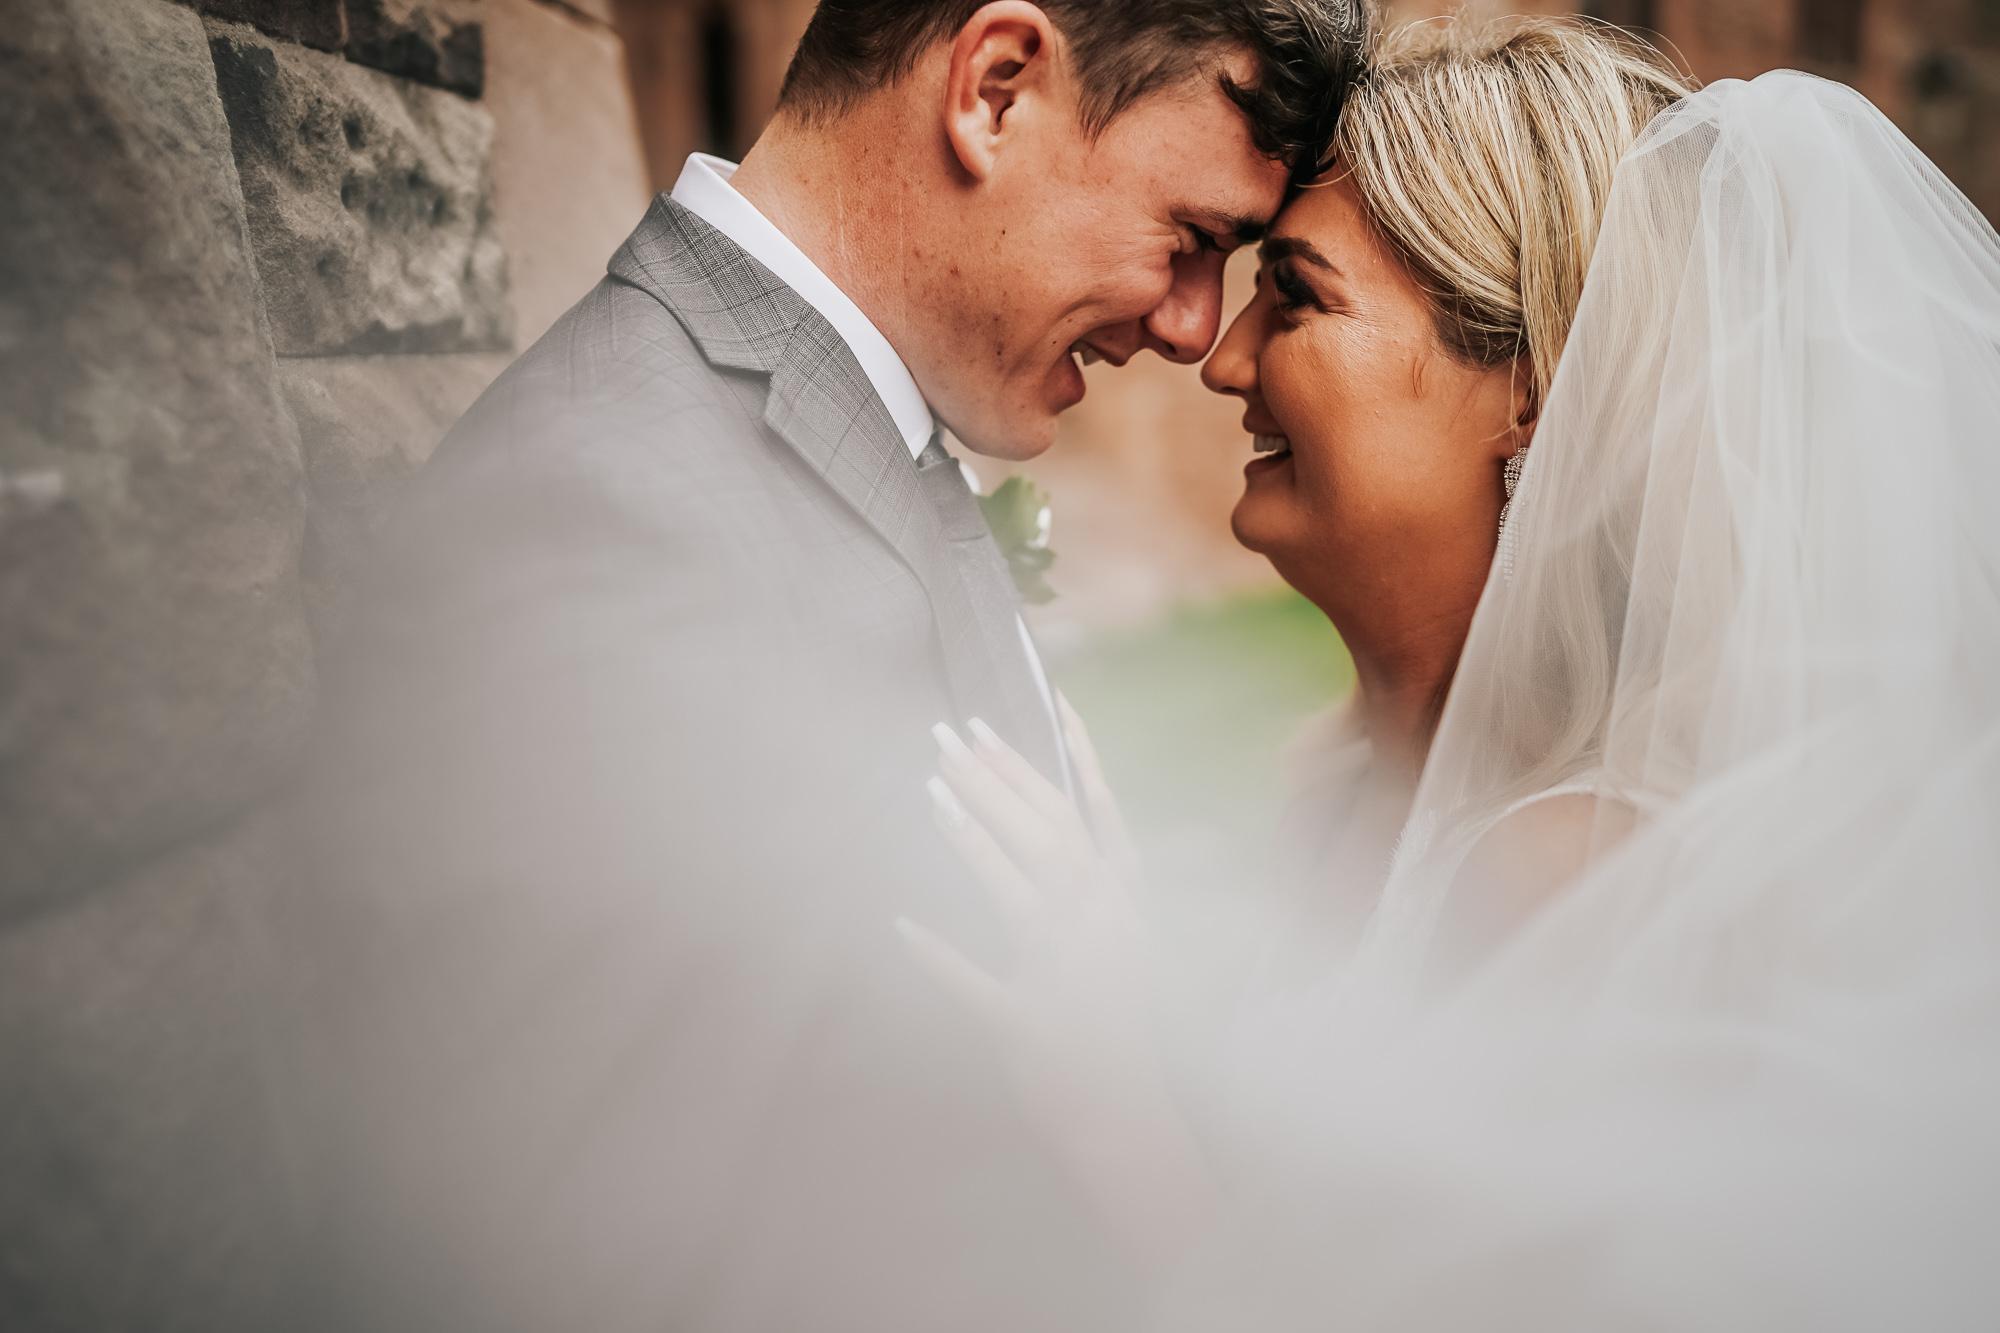 Peckforton Castle wedding photography cheshire wedding photographer (48 of 57).jpg